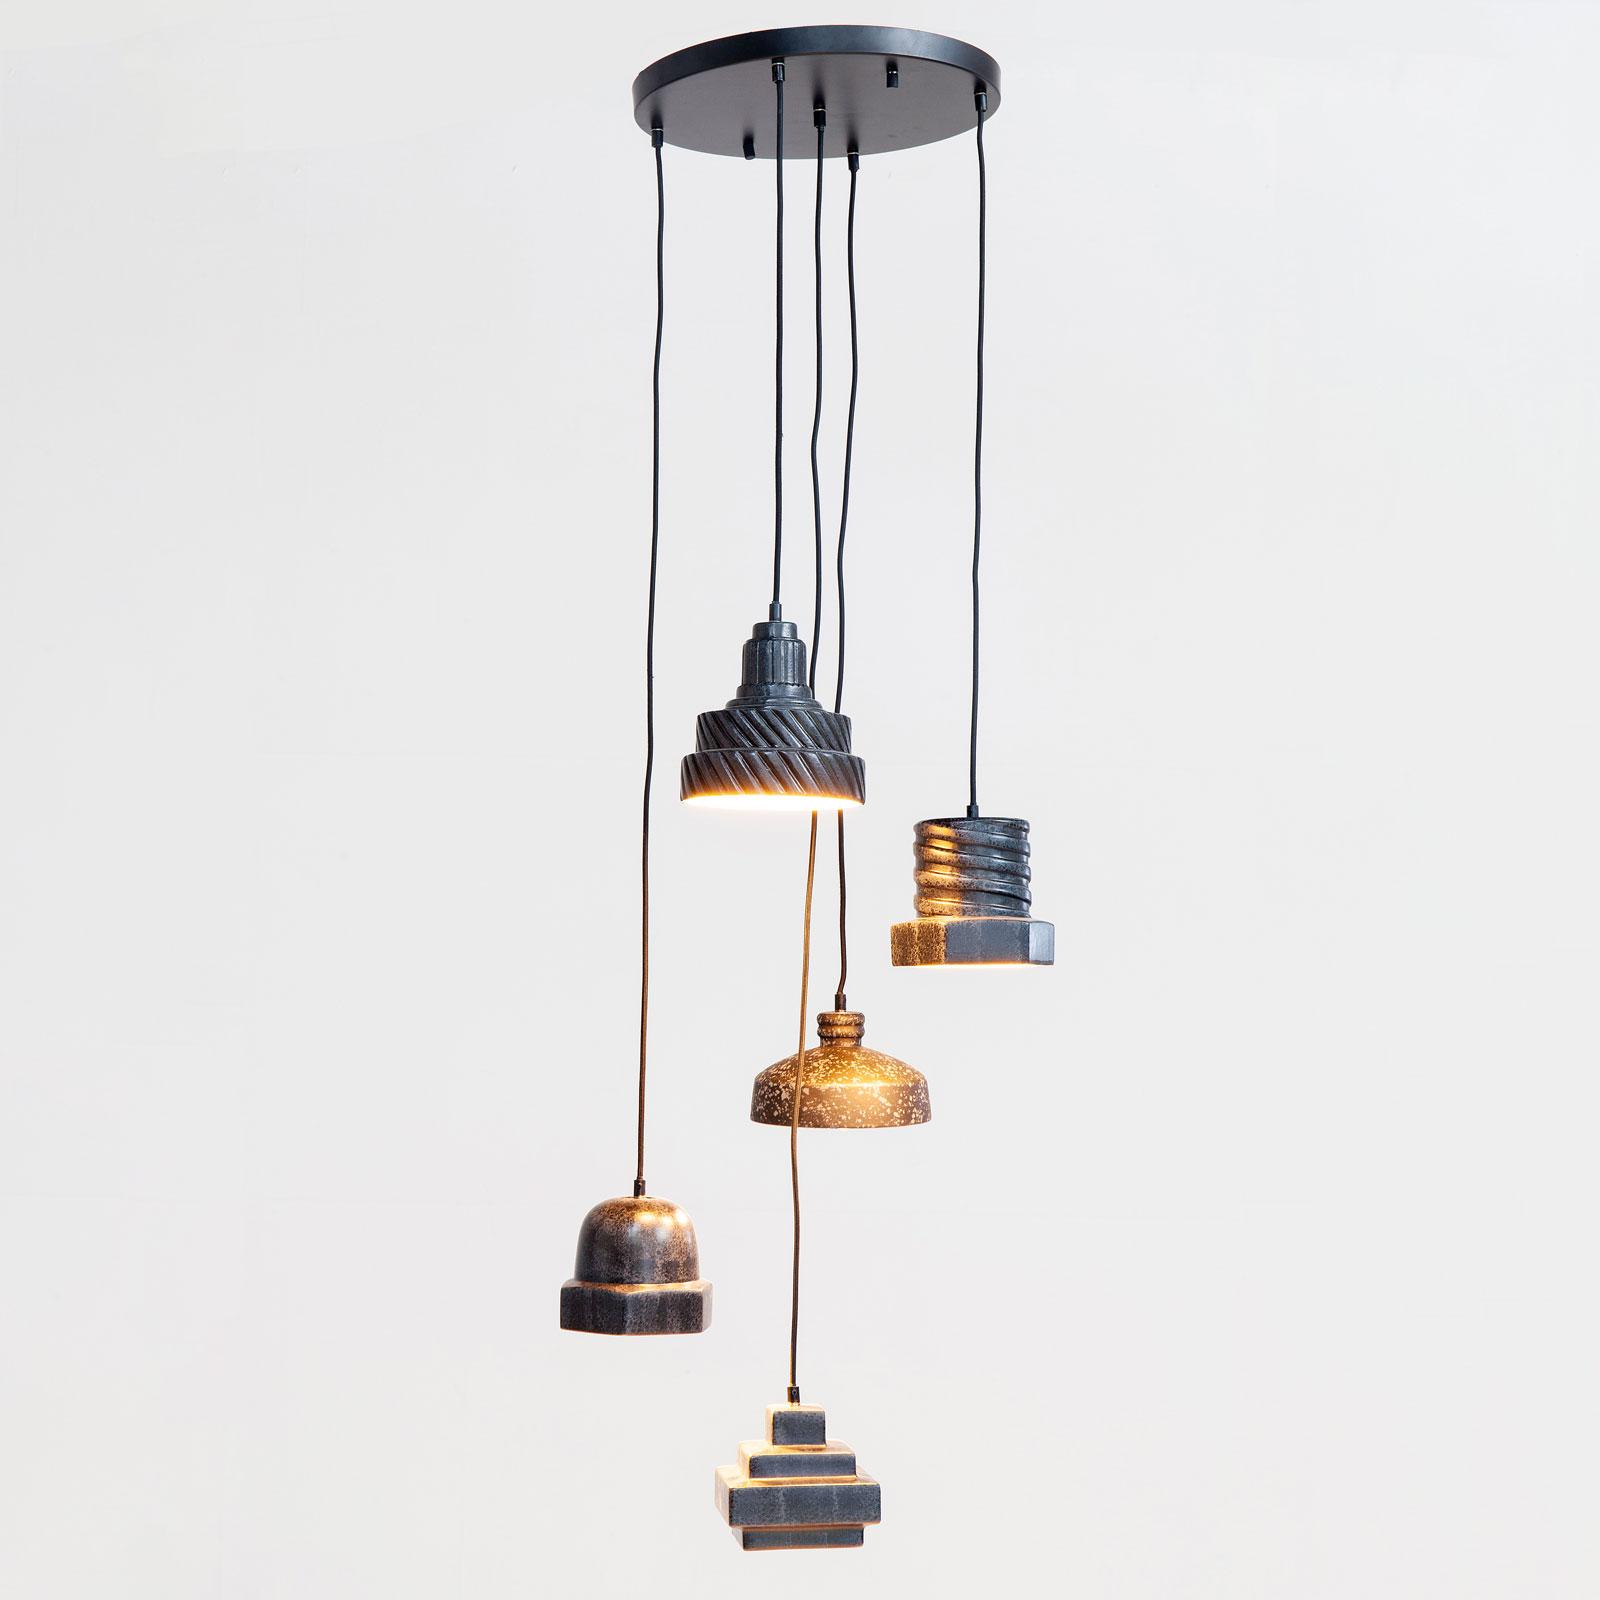 KARE Tool Spiral lampa wisząca, Ø 53 cm